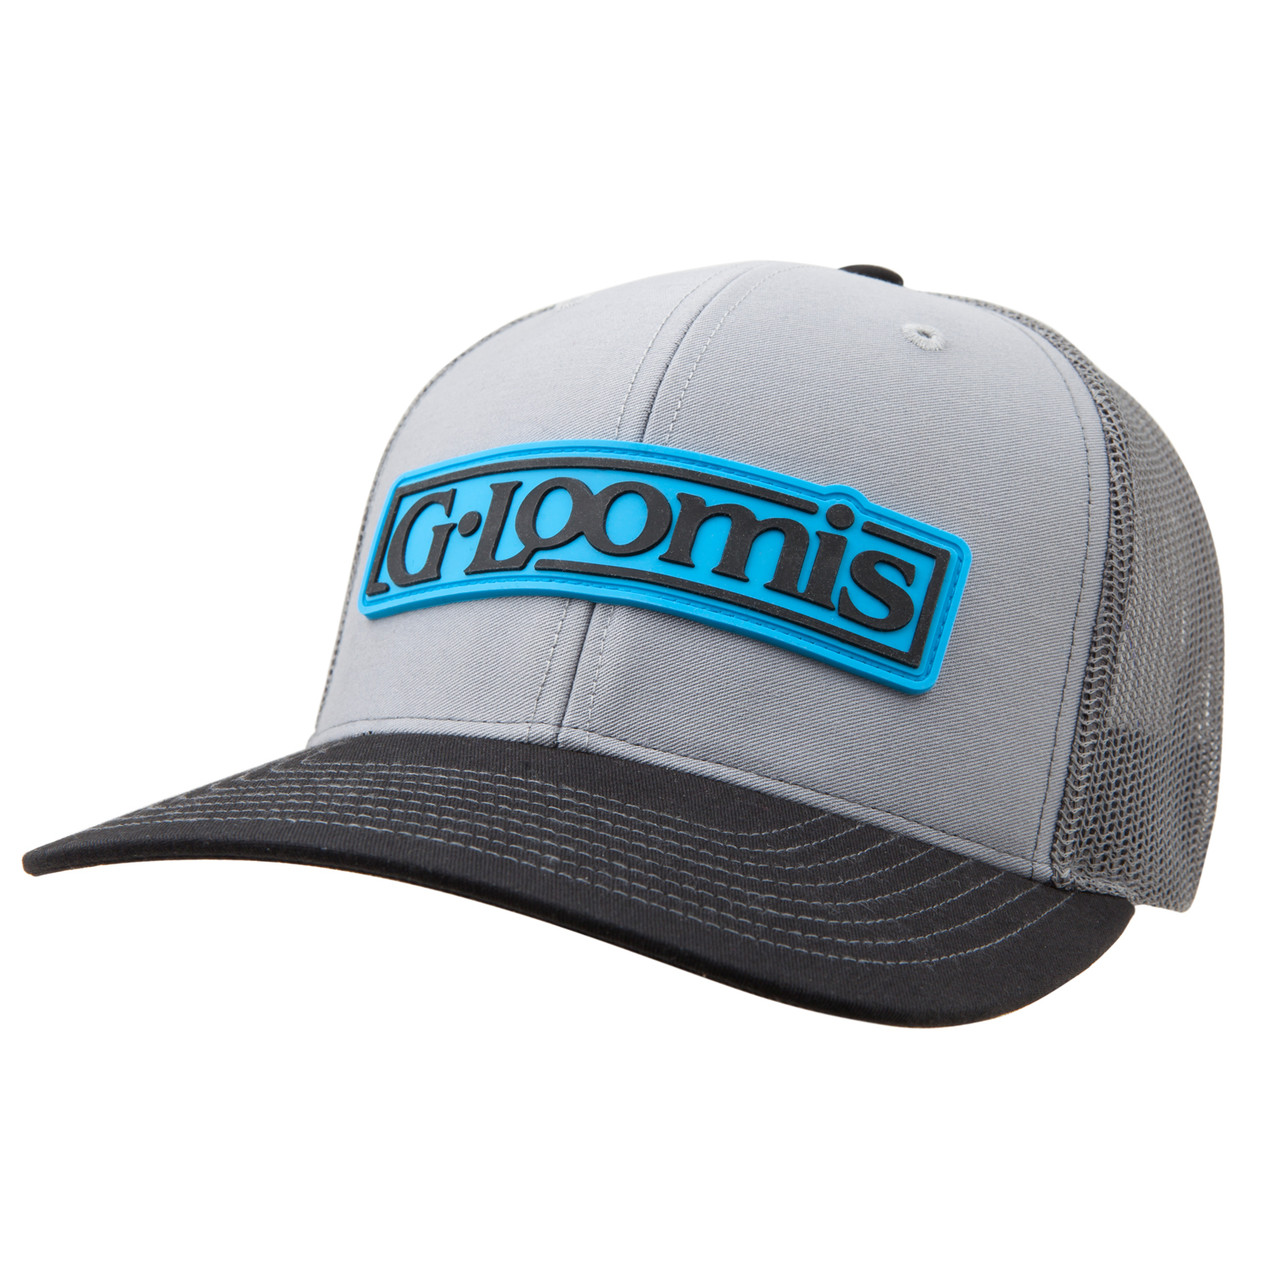 G. Loomis Rubber Logo Trucker Cap